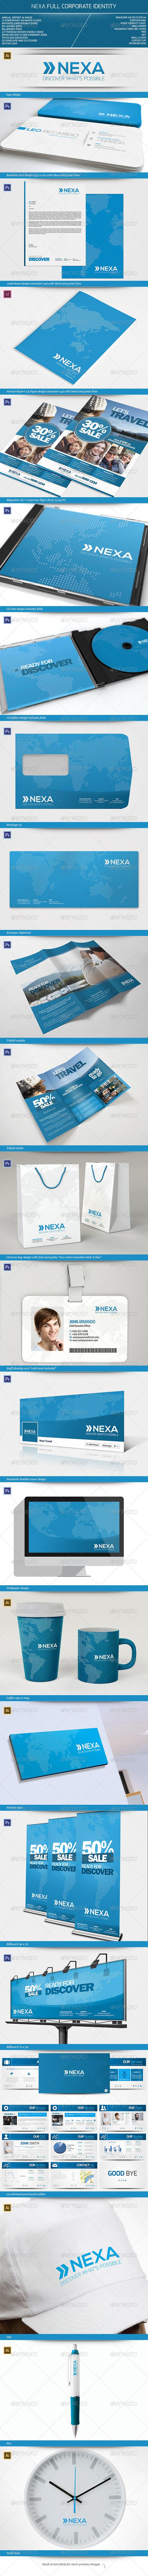 GraphicRiver Nexa Full Corporate Identity 5178634